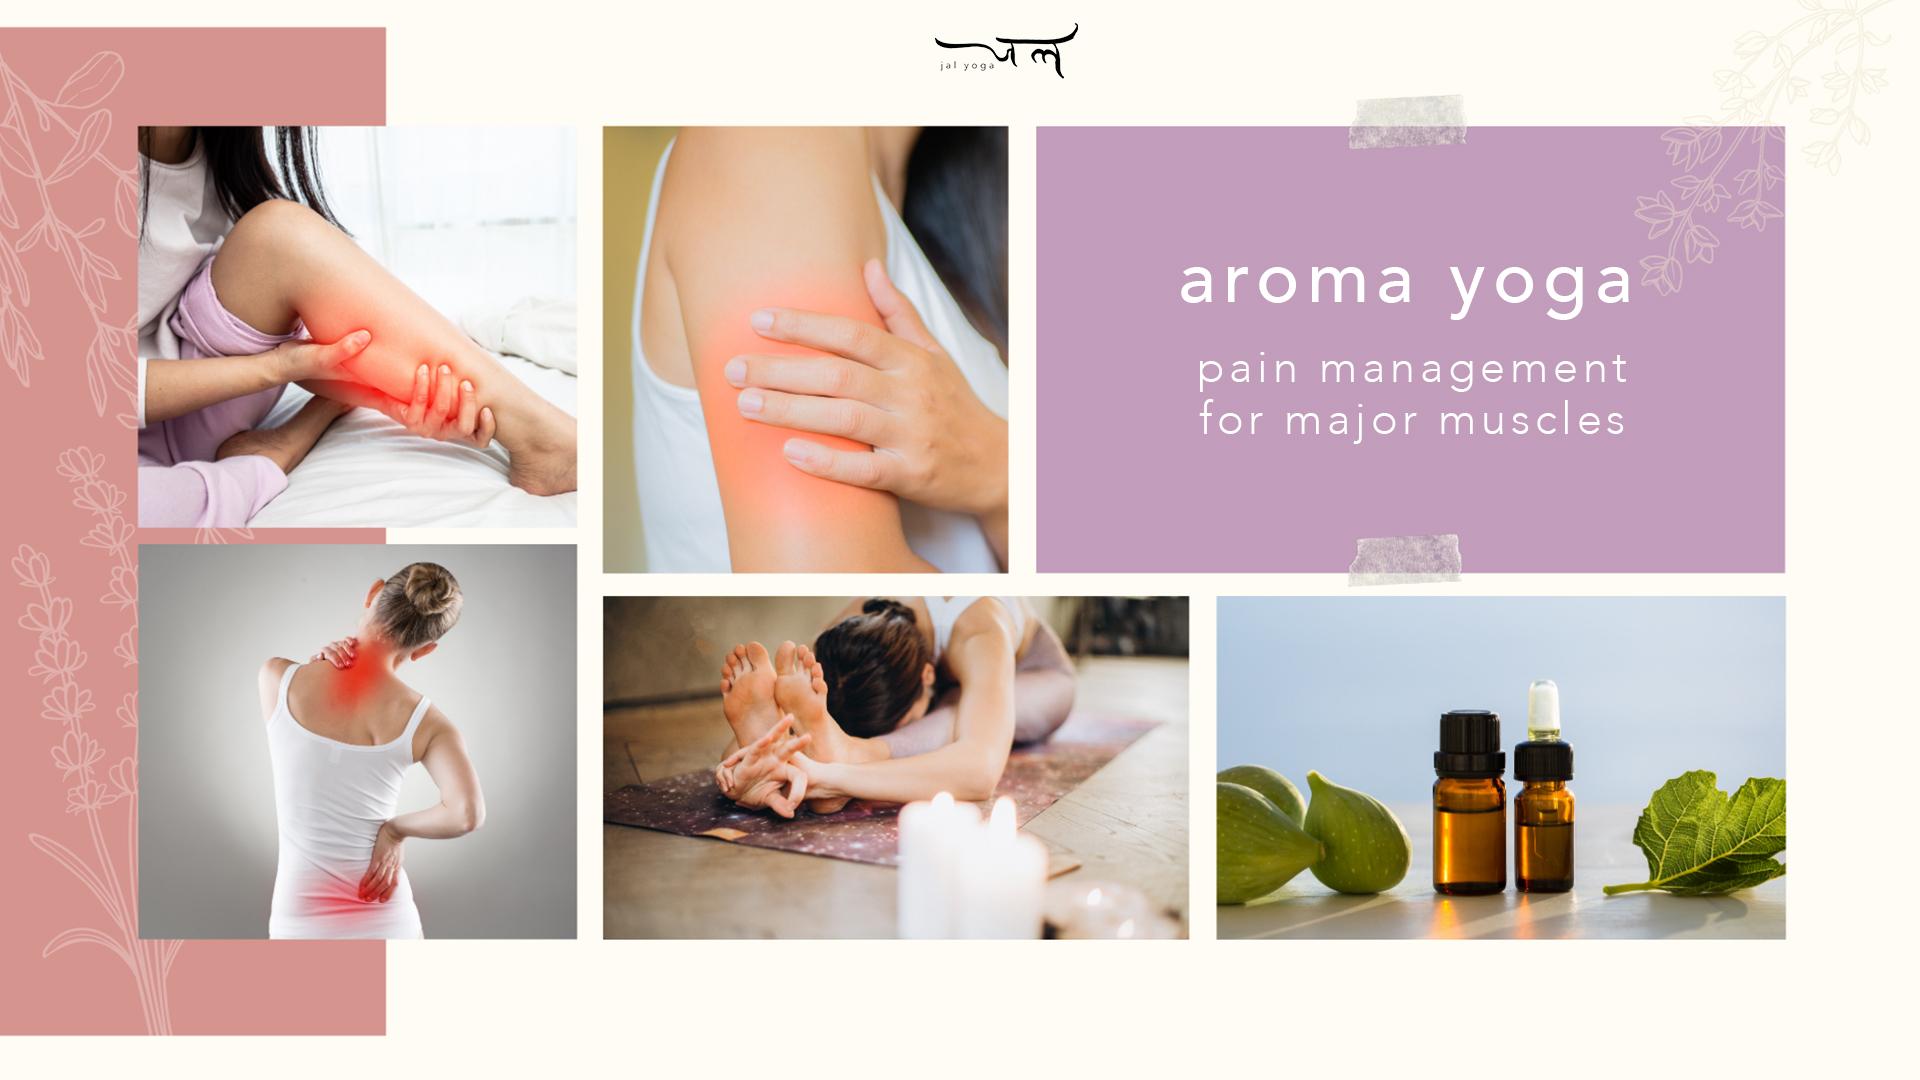 Aroma Yoga - Pain Management For Major Muscles Workshop | Jal Yoga